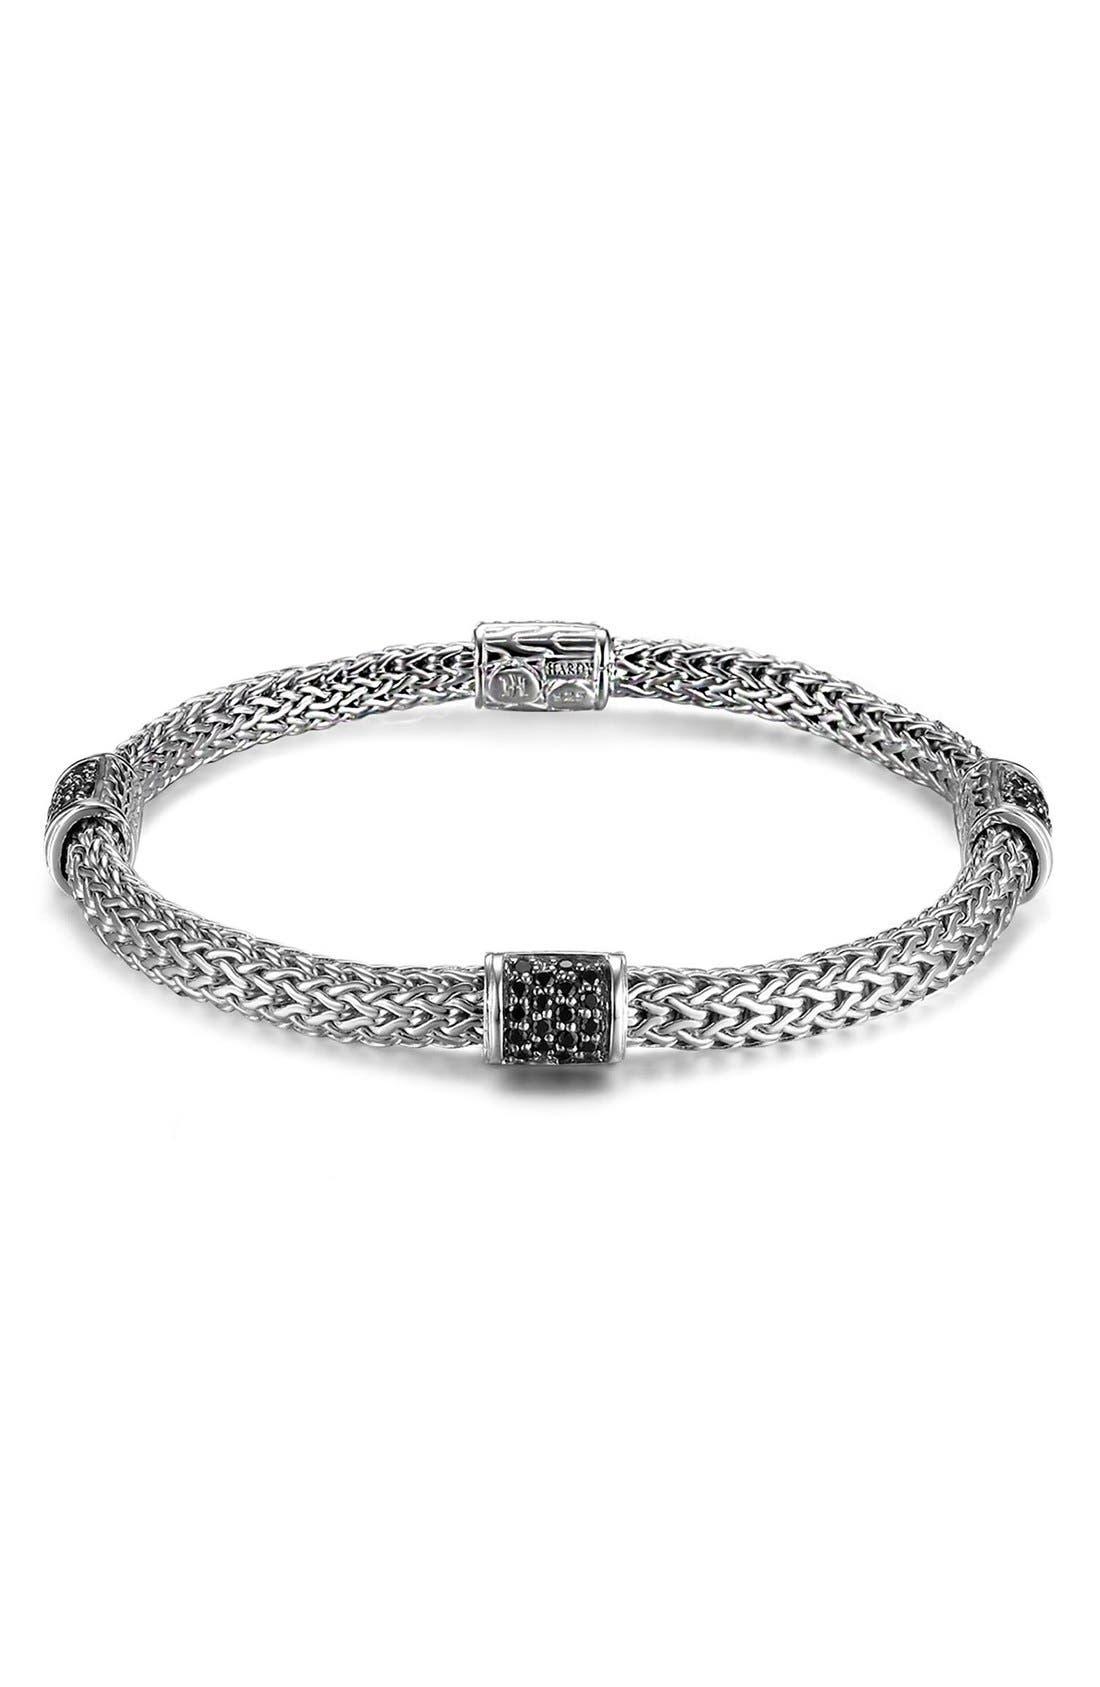 John Hardy 'Classic Chain - Lava' Extra Small Braided Bracelet